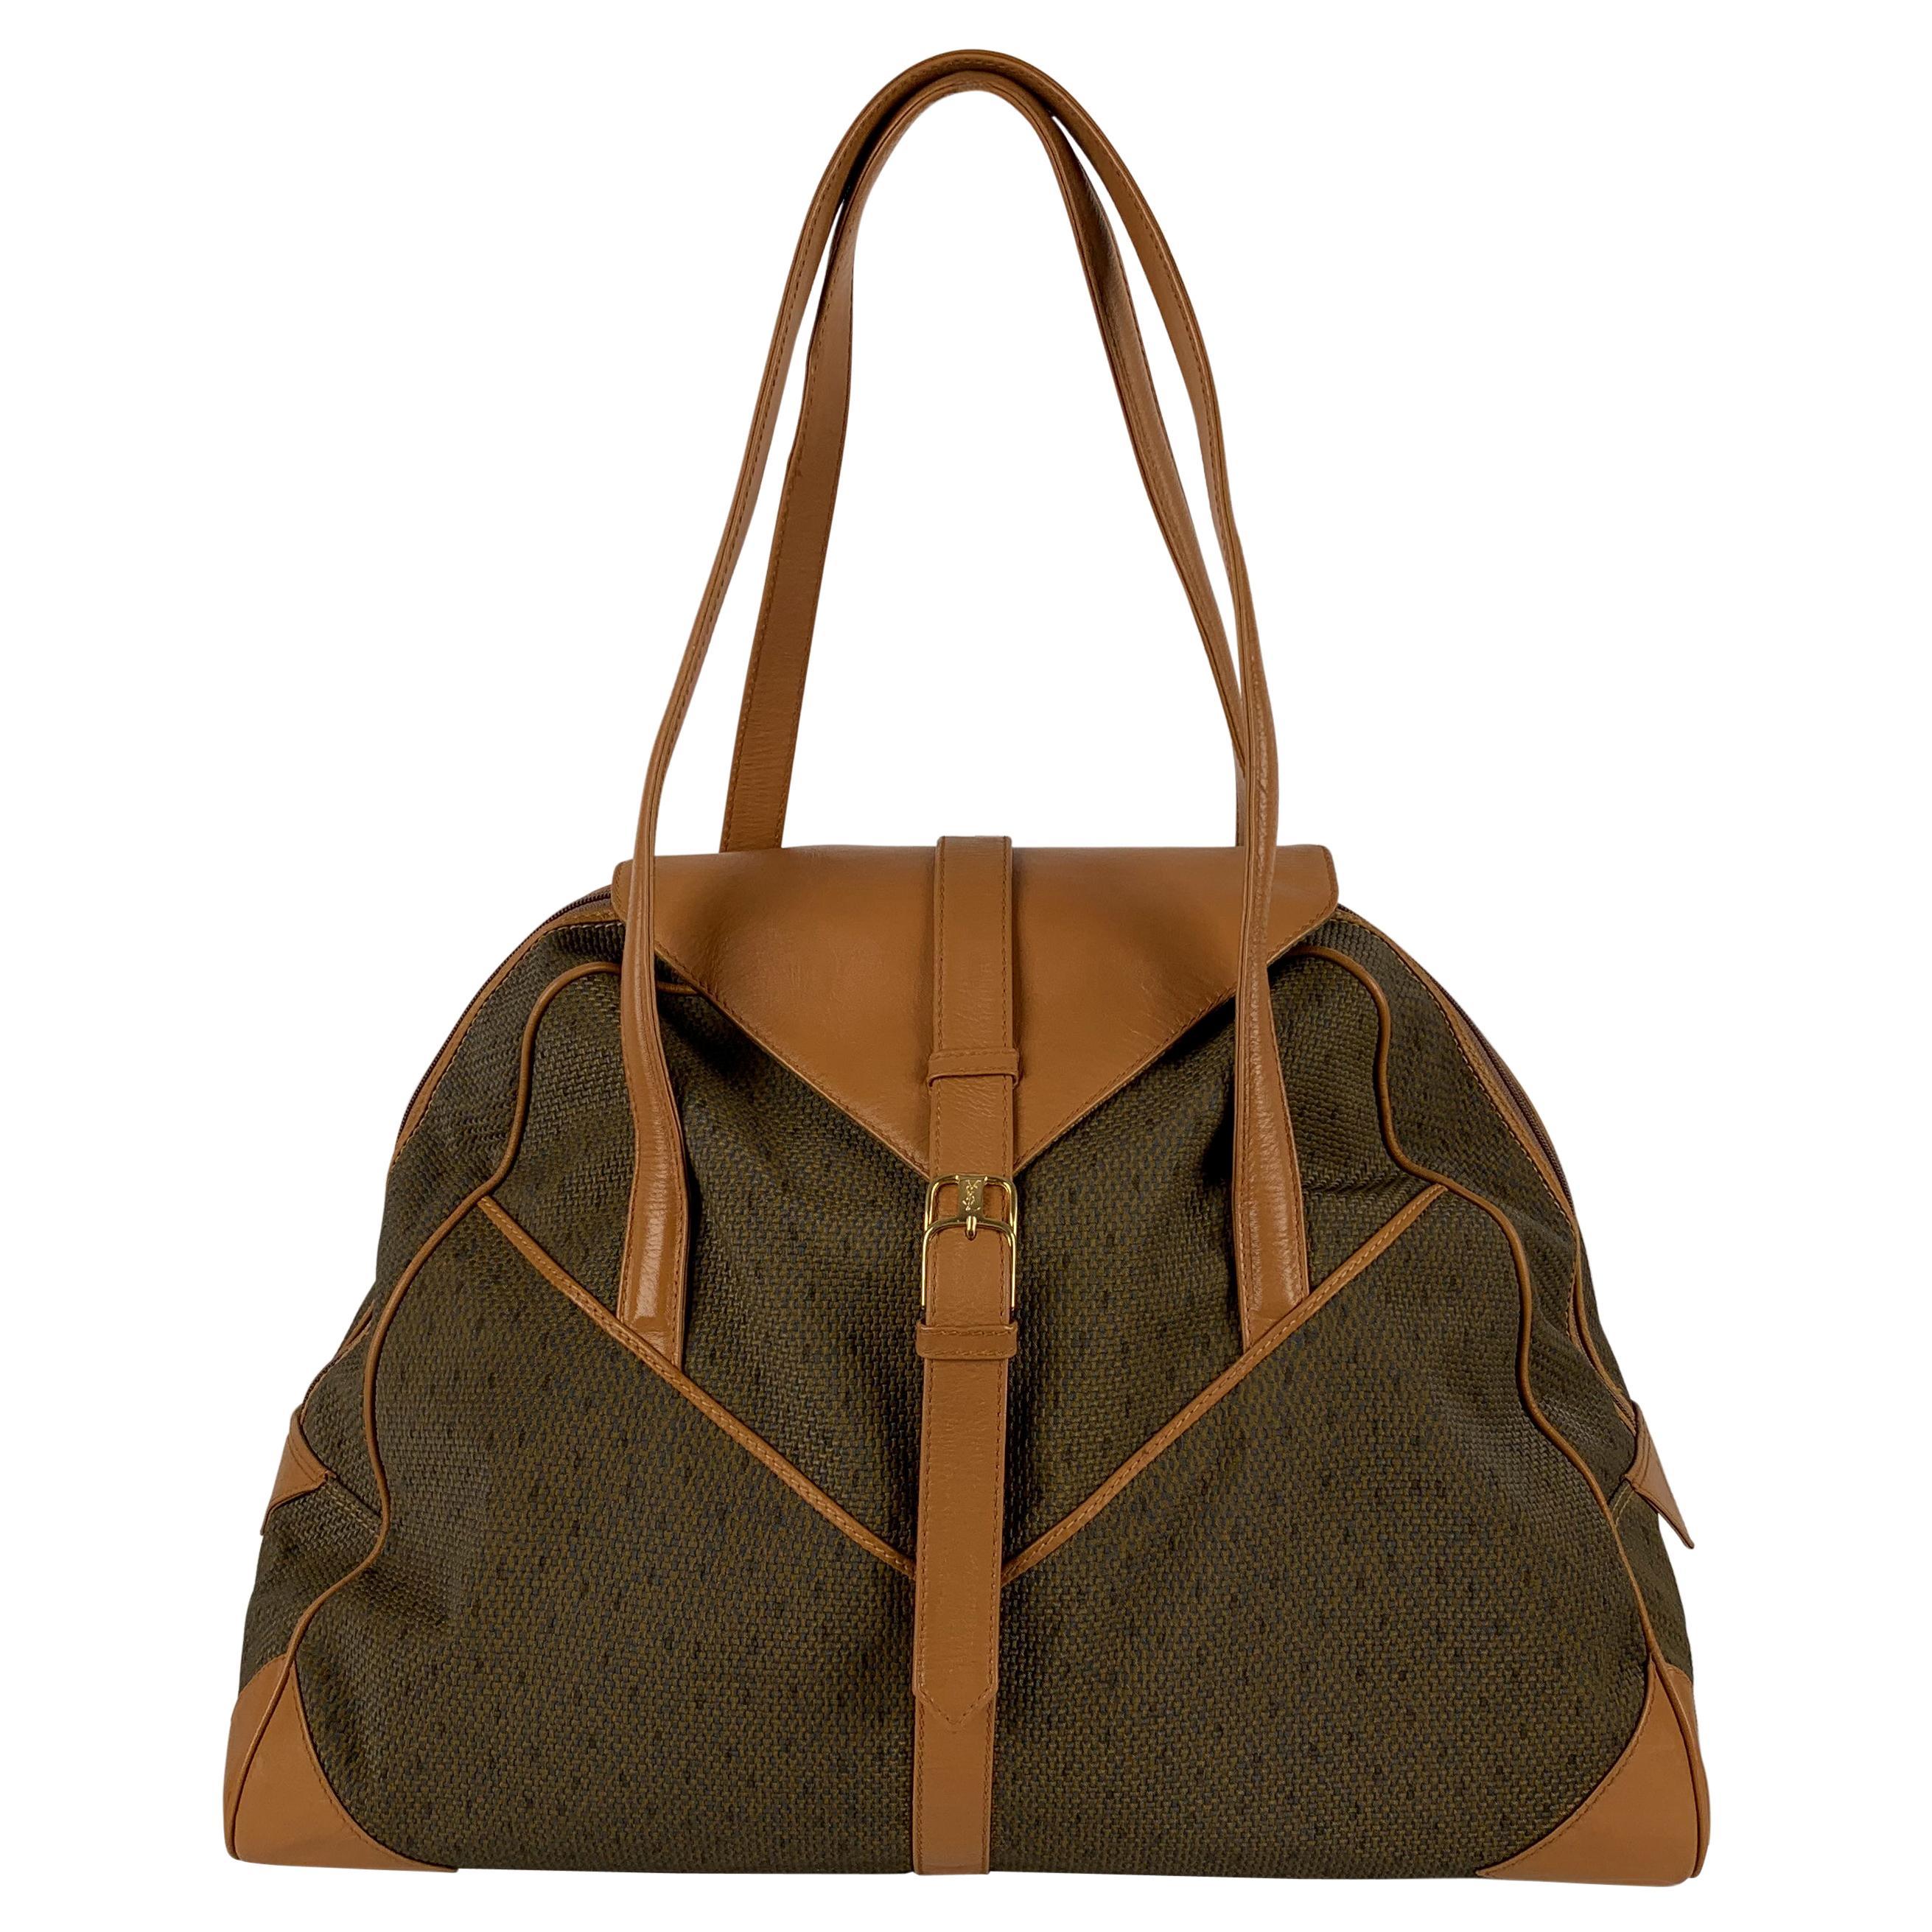 7c64ab8186 Vintage Yves Saint Laurent Handbags and Purses - 187 For Sale at 1stdibs